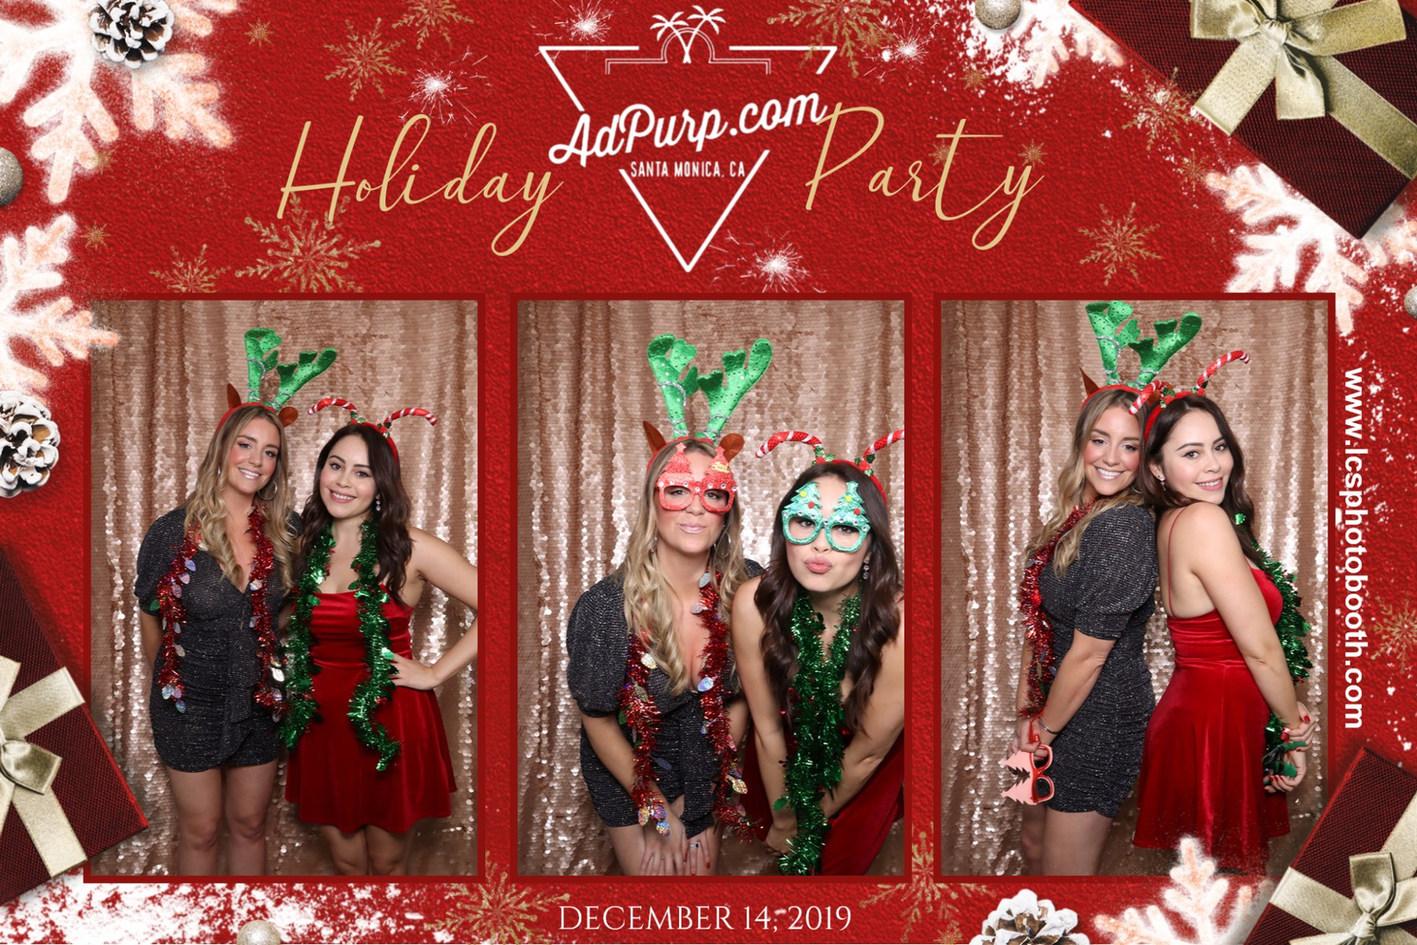 Holiday Party Hollywood, Ca